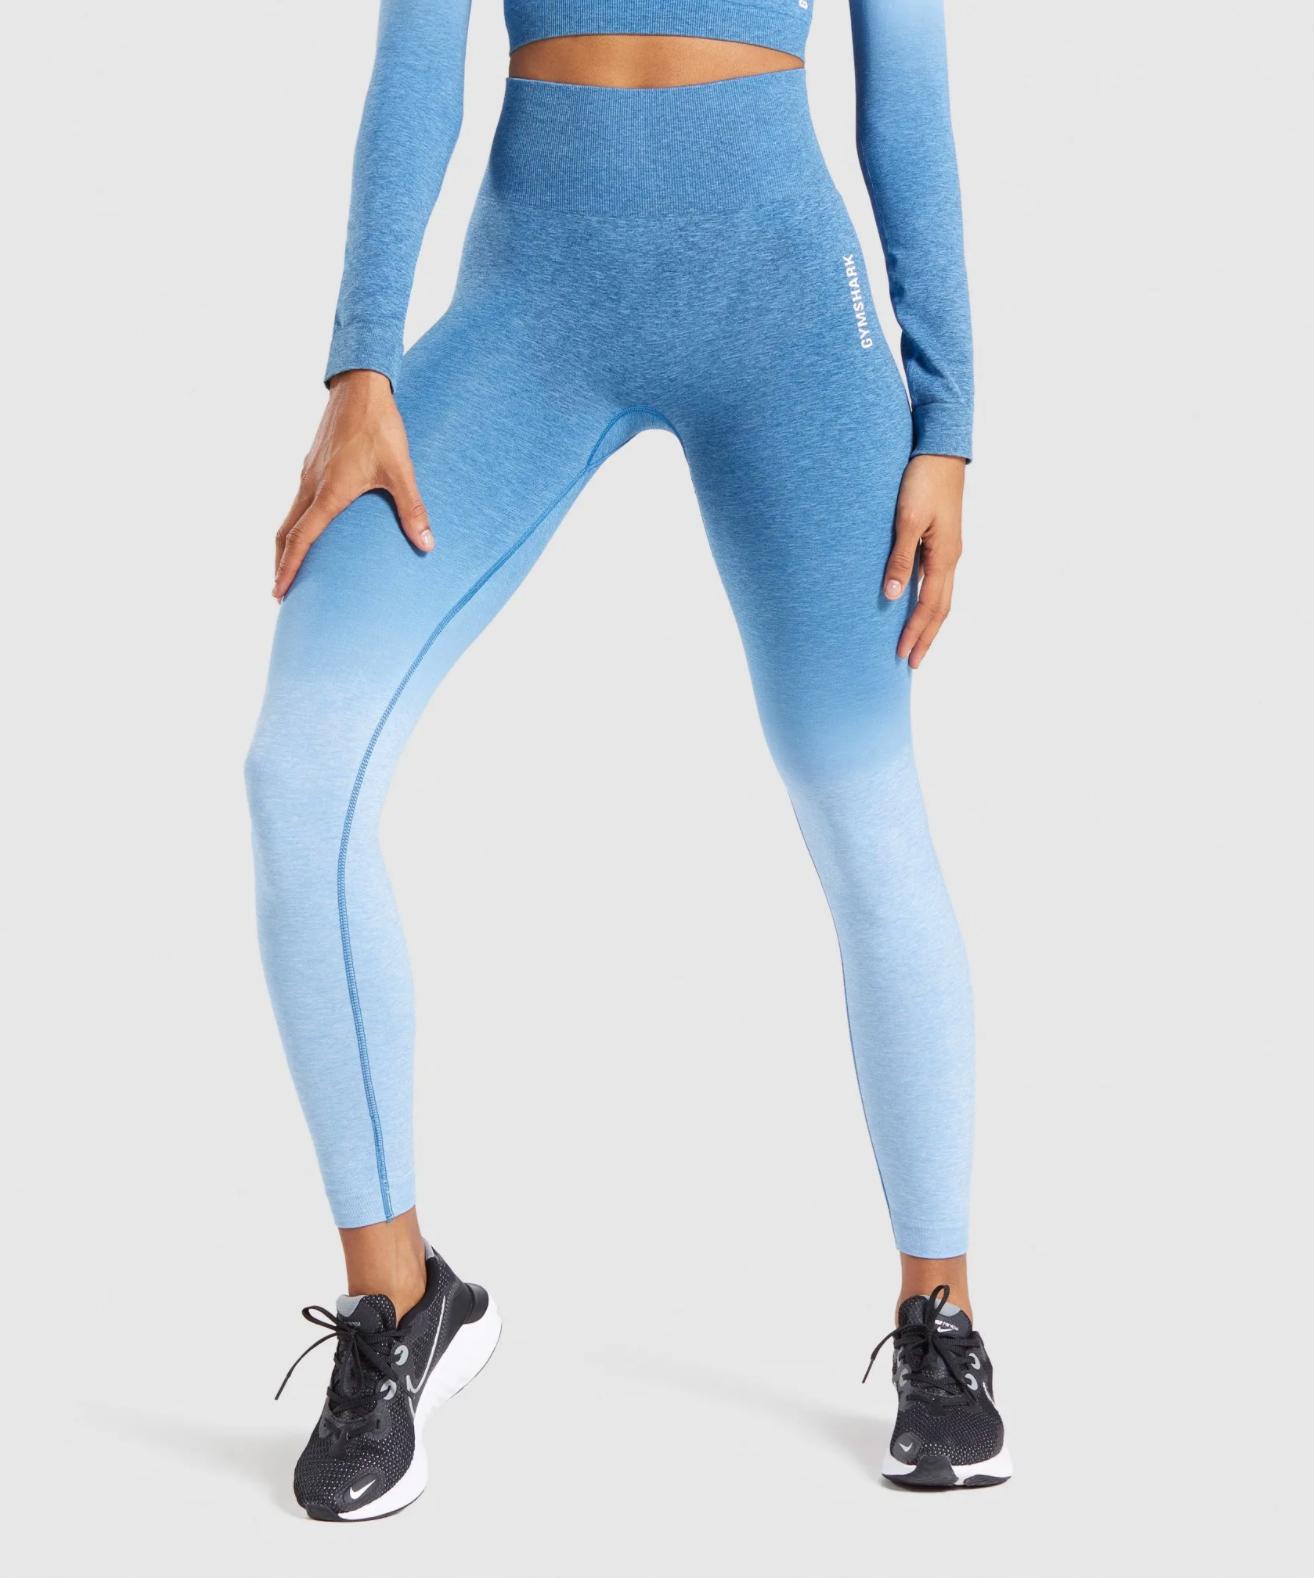 Gymshark Adapt Ombre Seamless in Powder Blue Marl:Luna blue